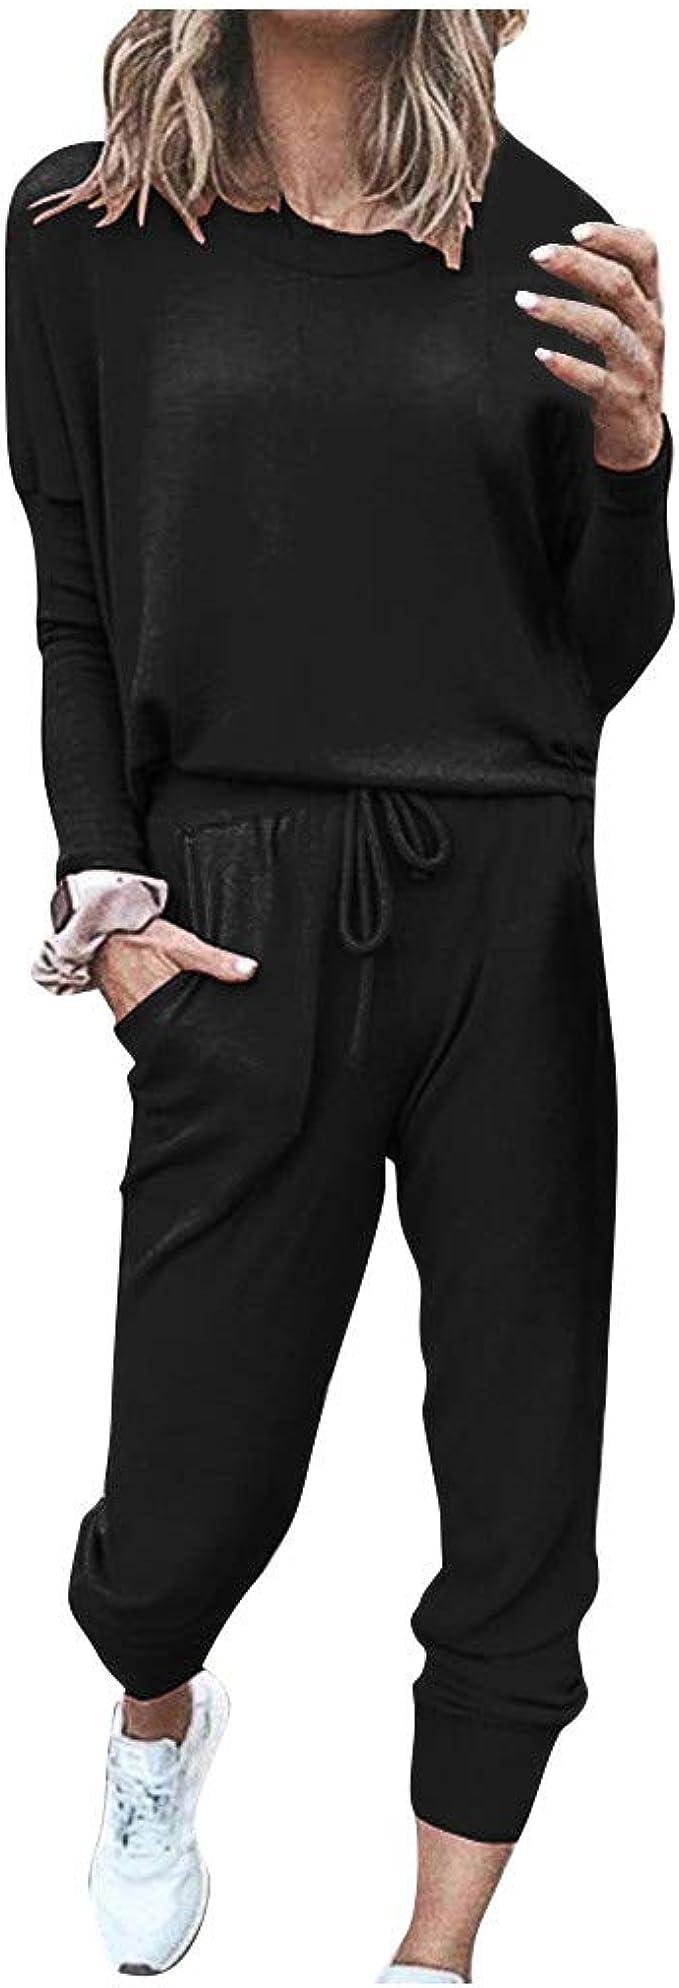 Women Tracksuit 2Pcs Leopard Print Hoodies Sweatshirt Top Pants Set Lounge Wear